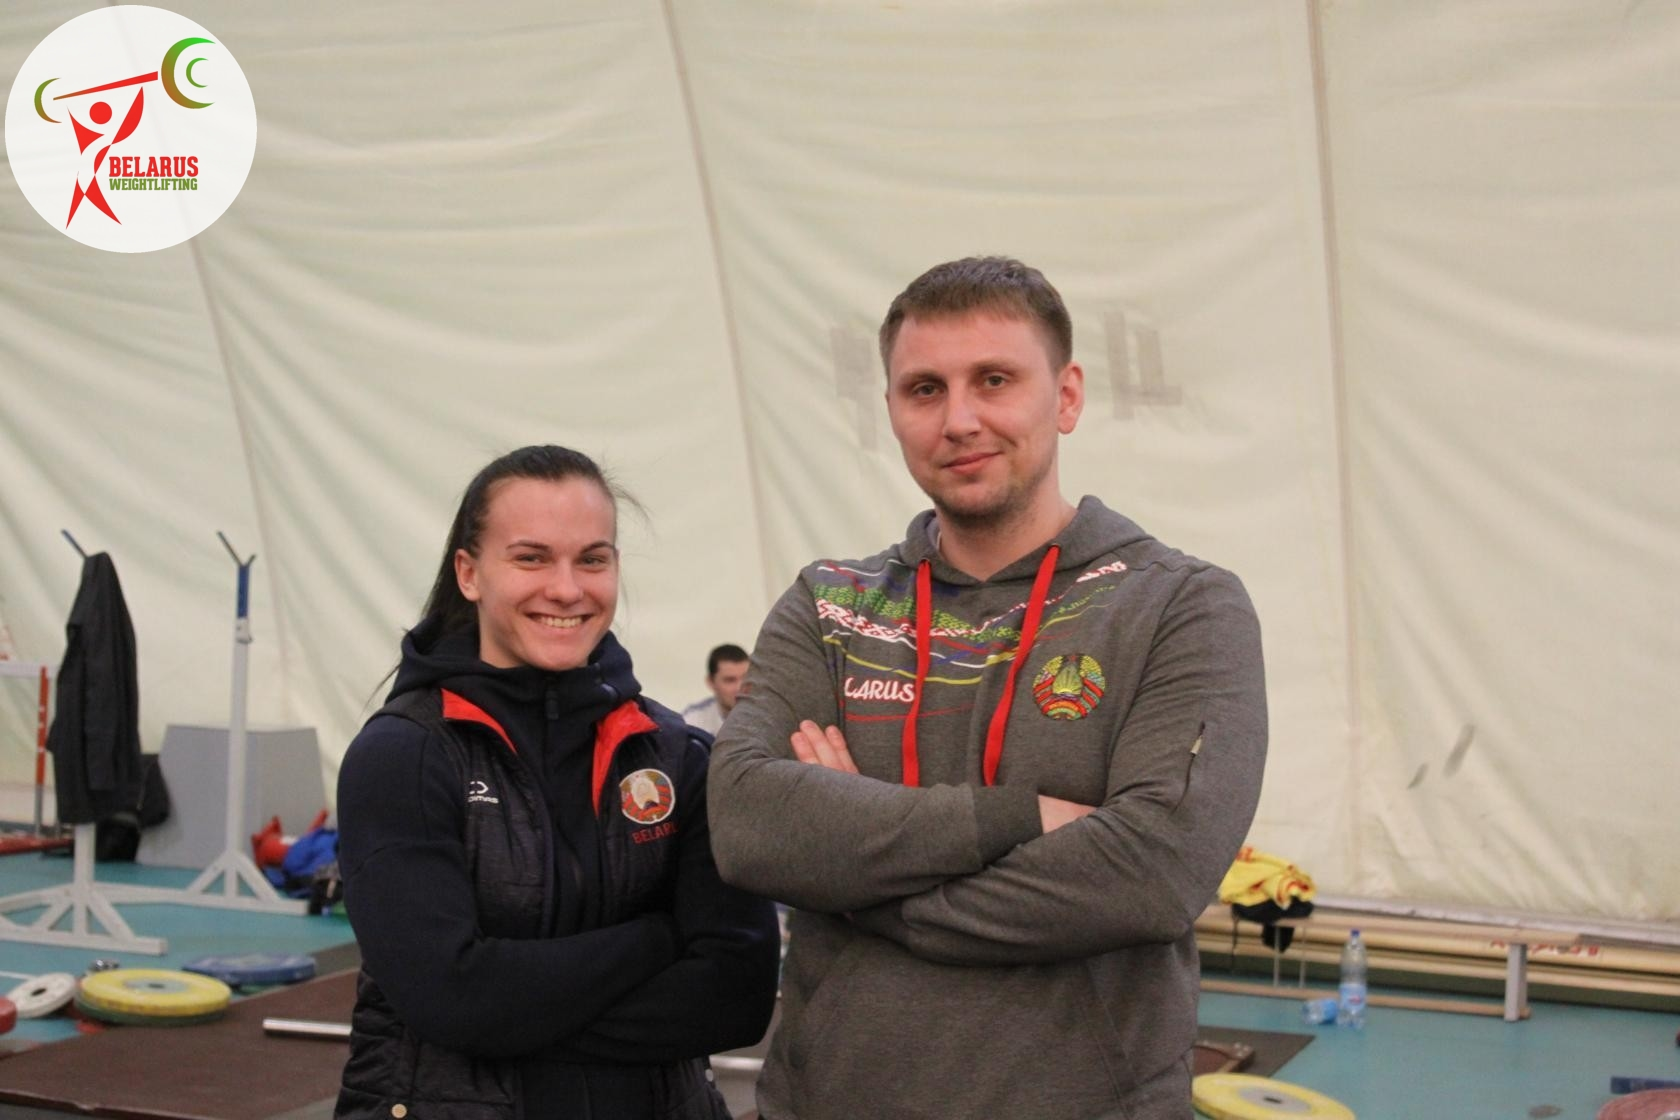 Daria Naumova und Valeriy Sizenok